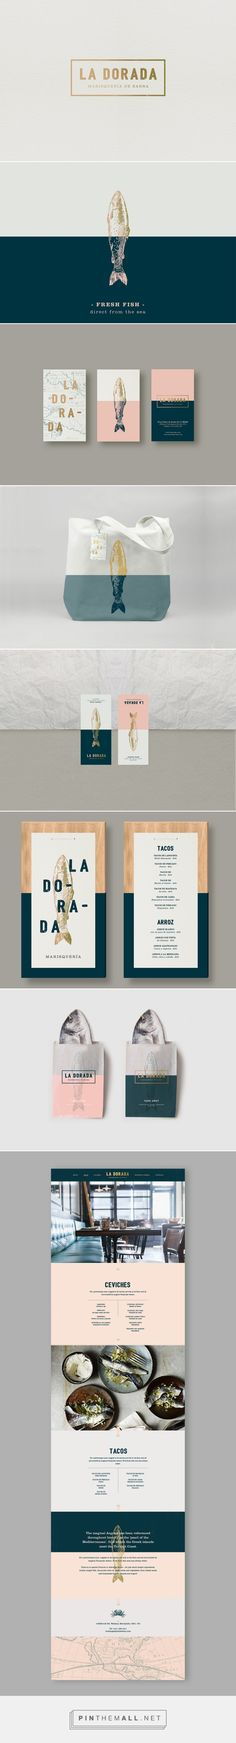 La Dorada on Behance - created via http://pinthemall.net